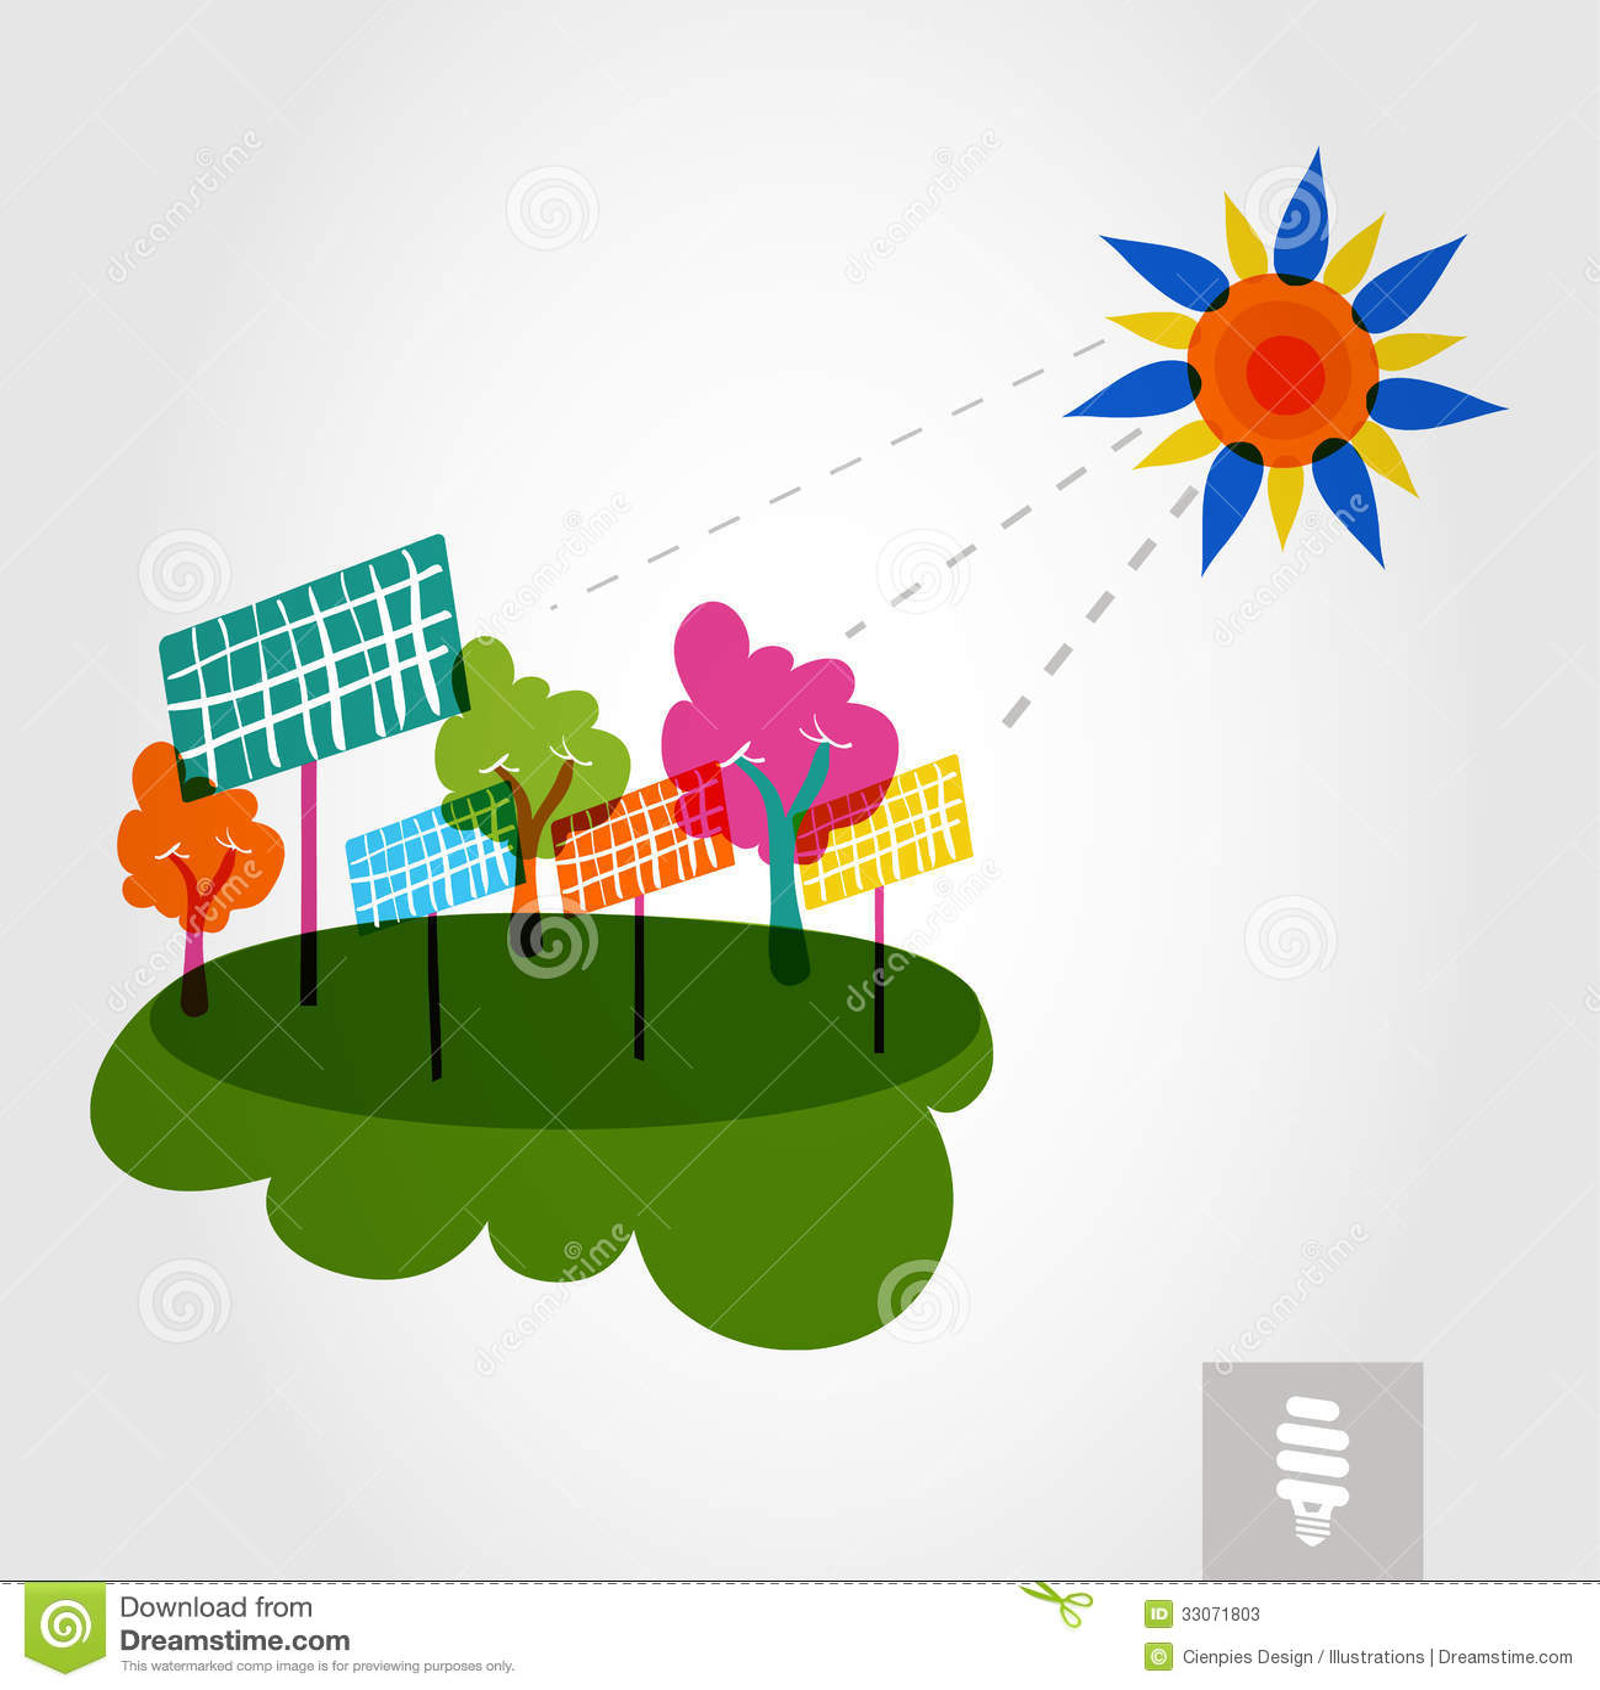 Go Green City Sun Trees And Solar Panels Stock Image